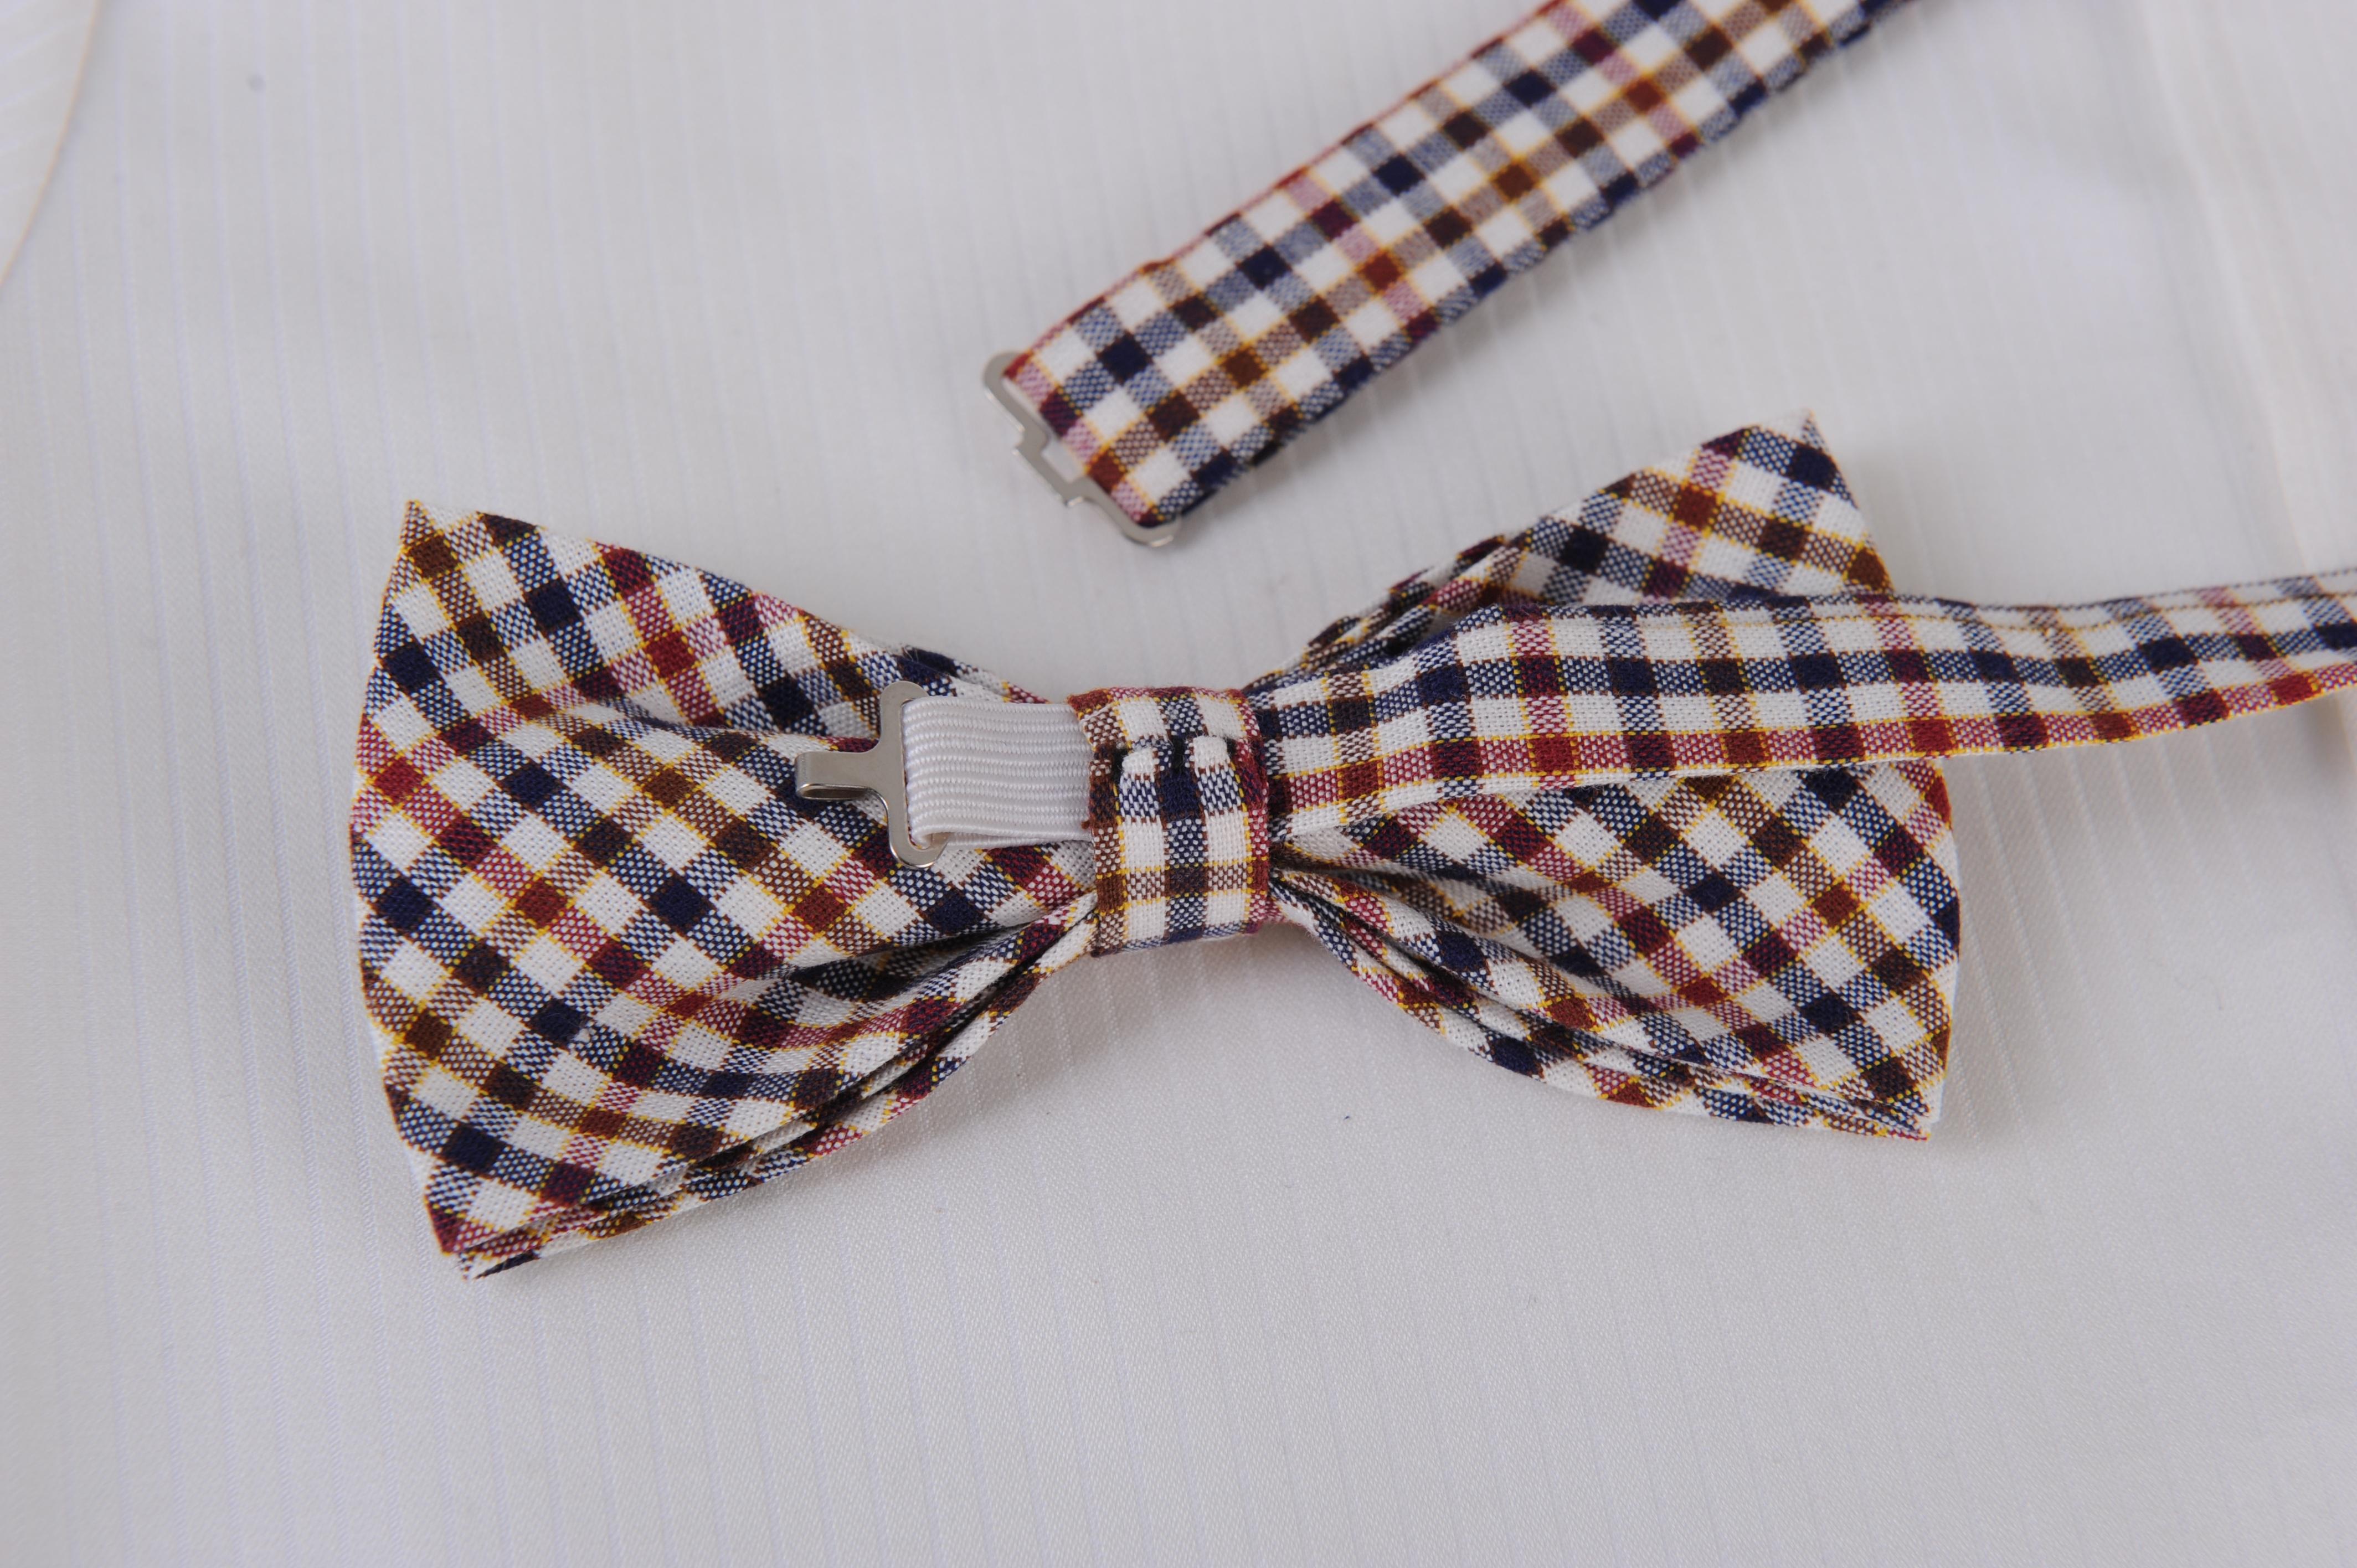 Kostenlose foto : Muster, Hemd, Krawatte, Textil-, Kunst, Entwurf ...